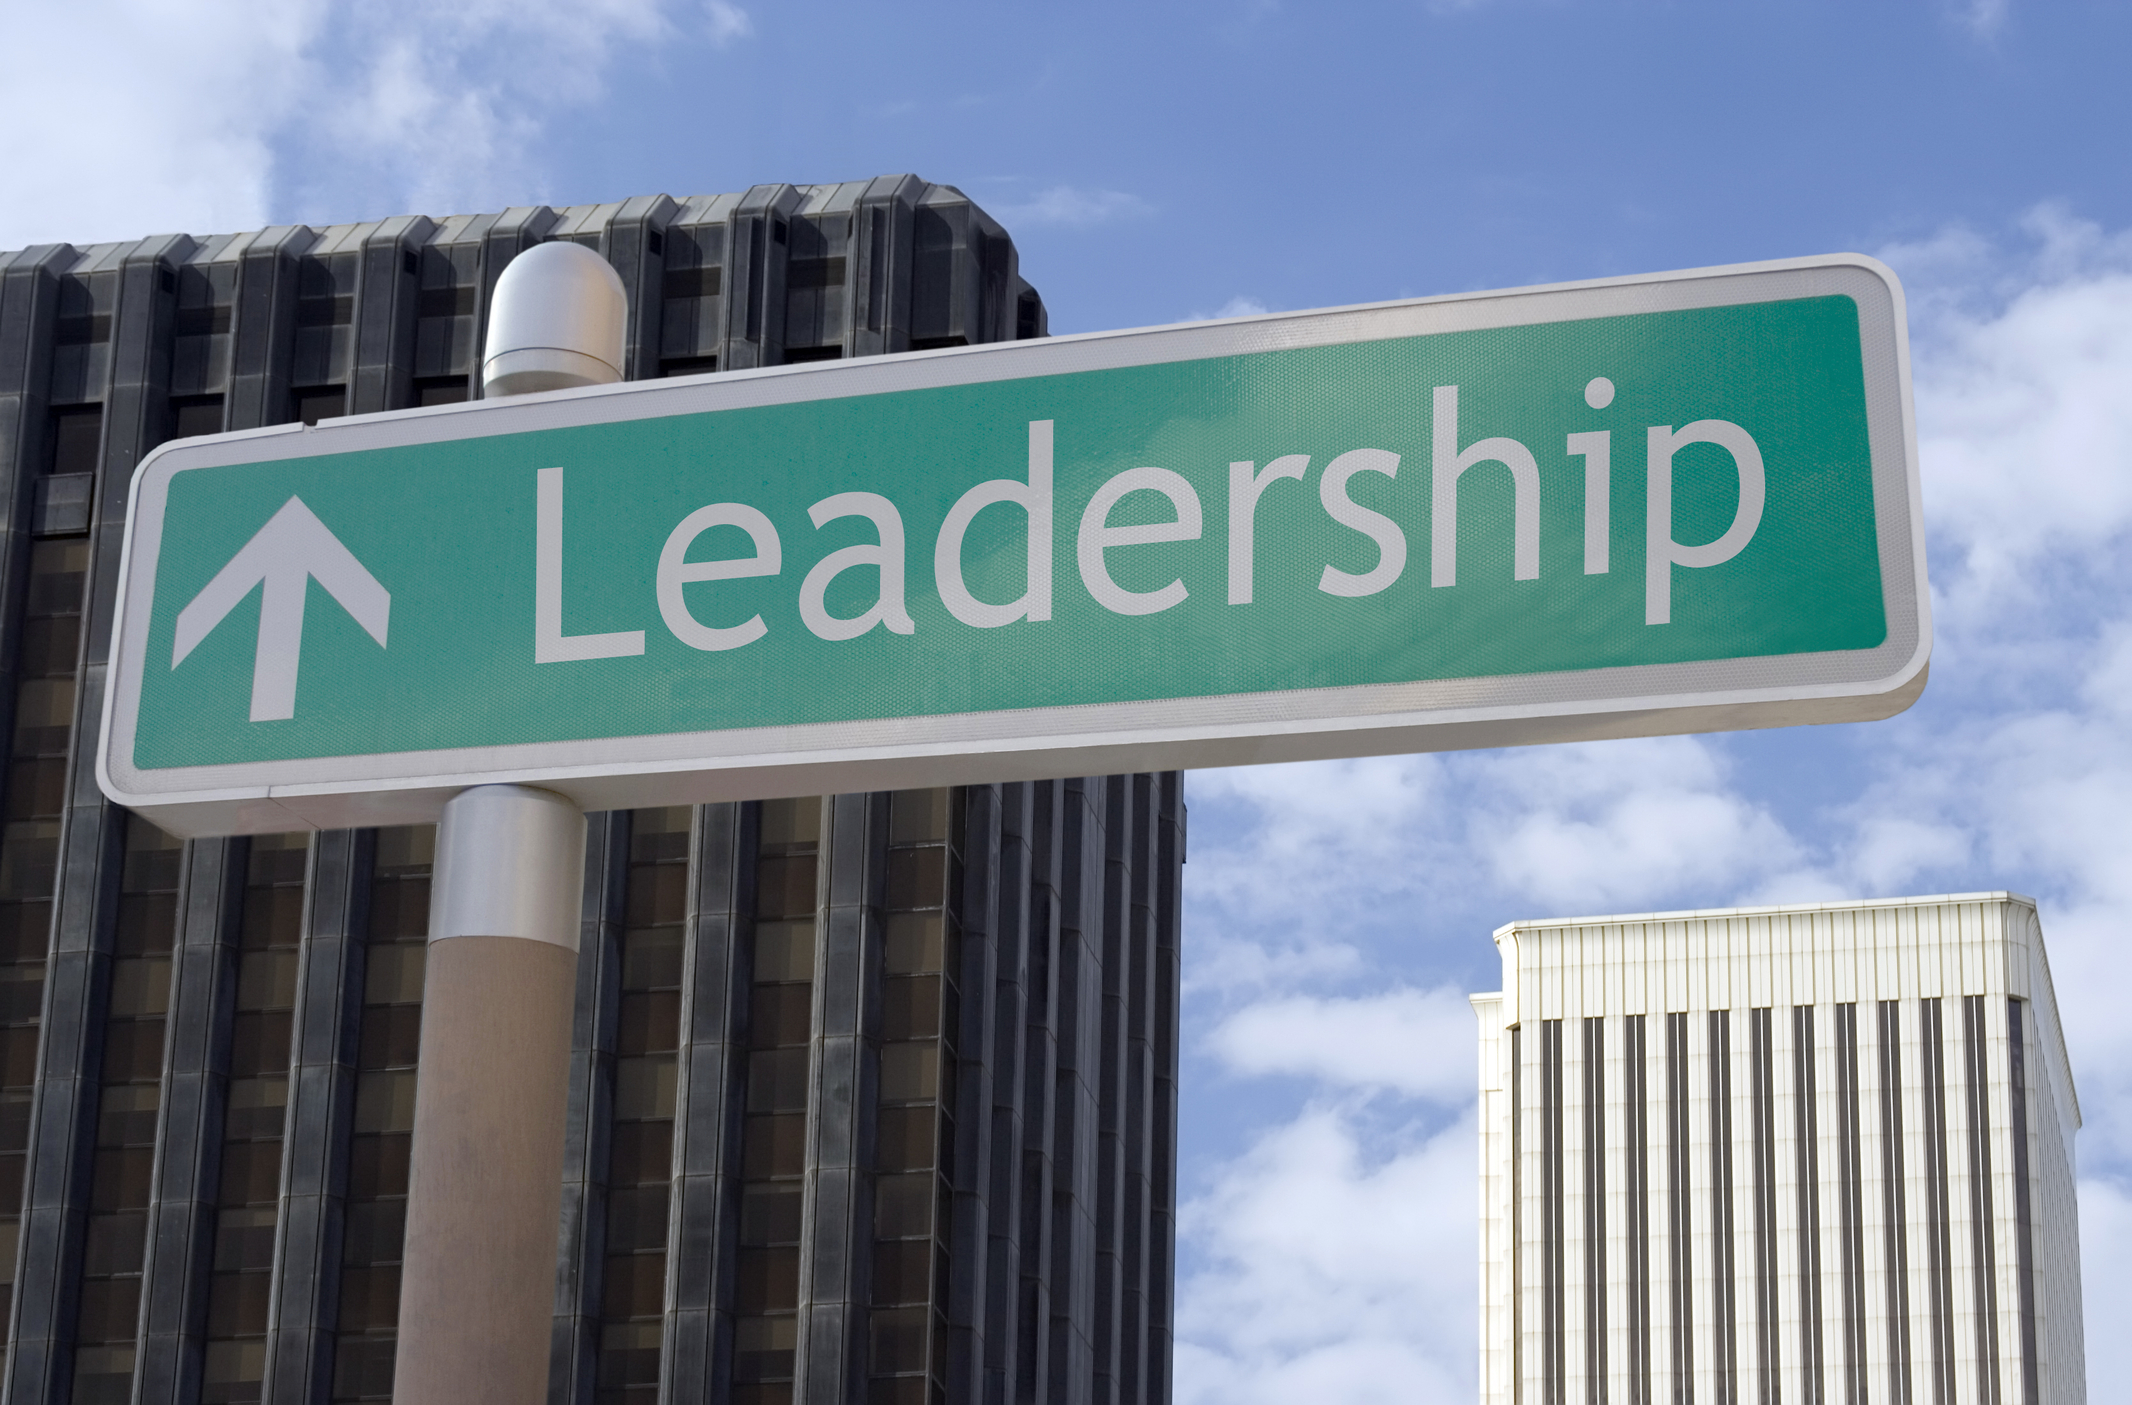 Management and leadership development training